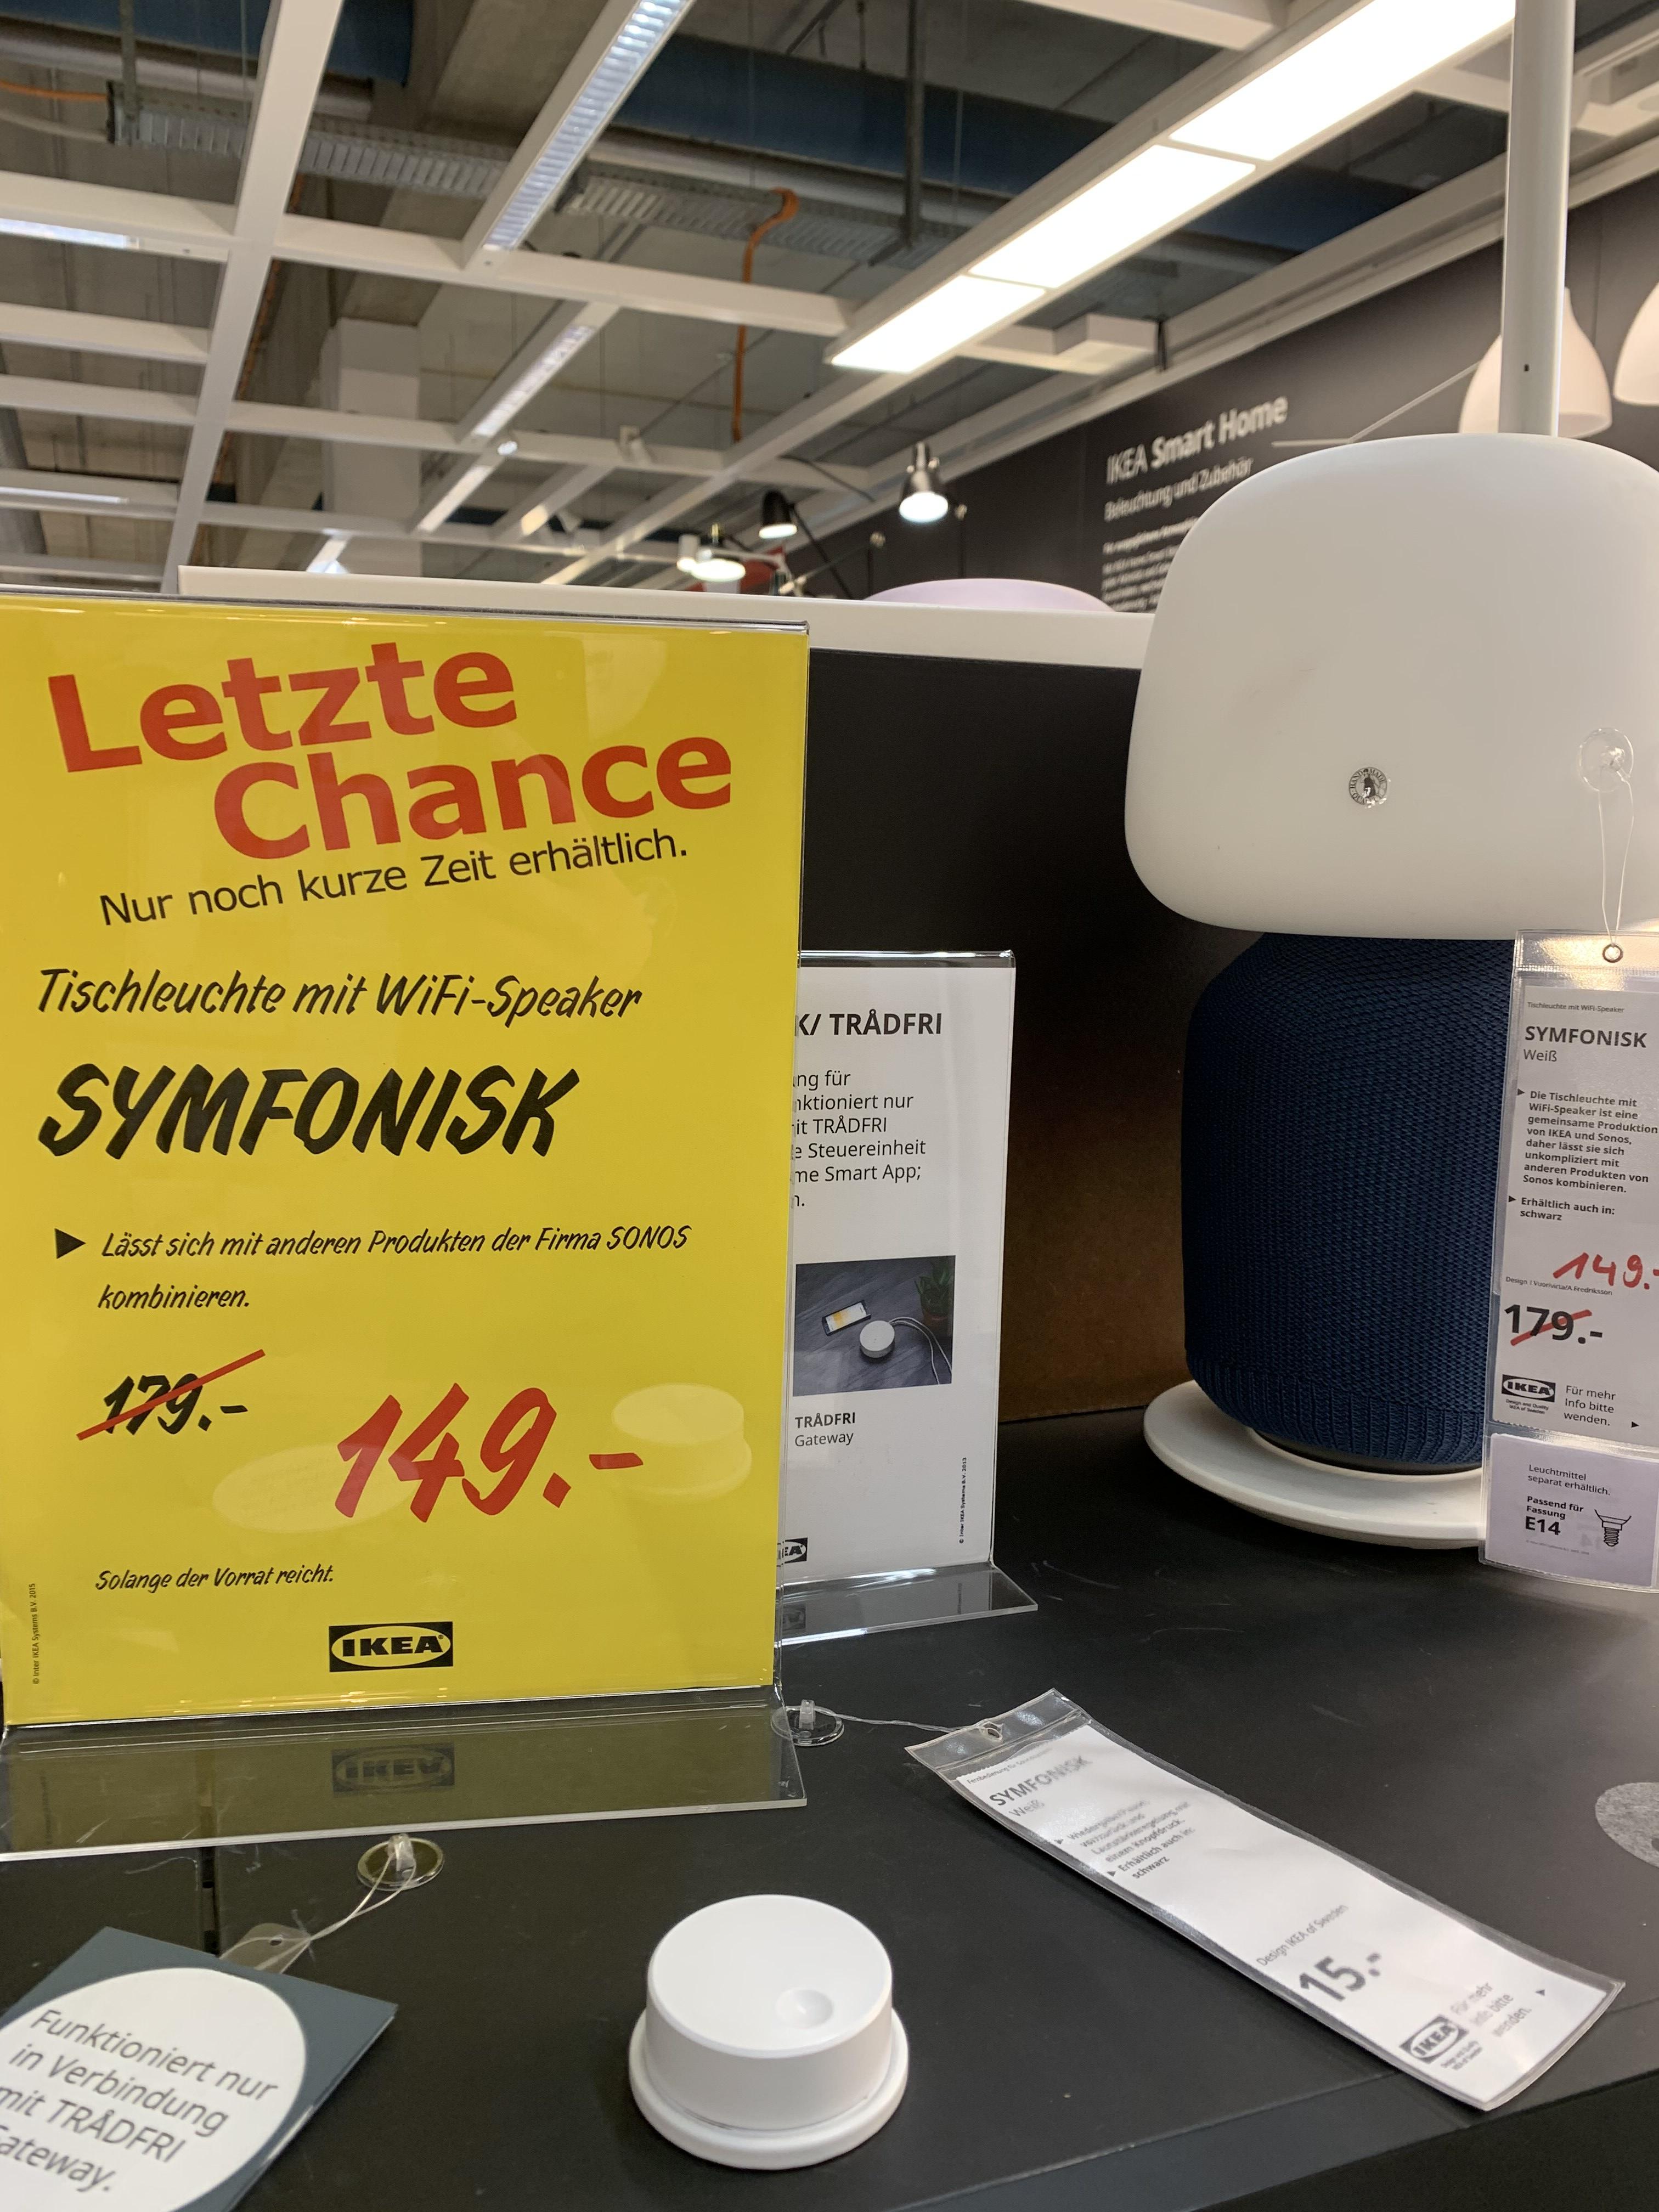 Lokal - Ikea Symfonisk (nur Ikea HH-Schnelsen?)